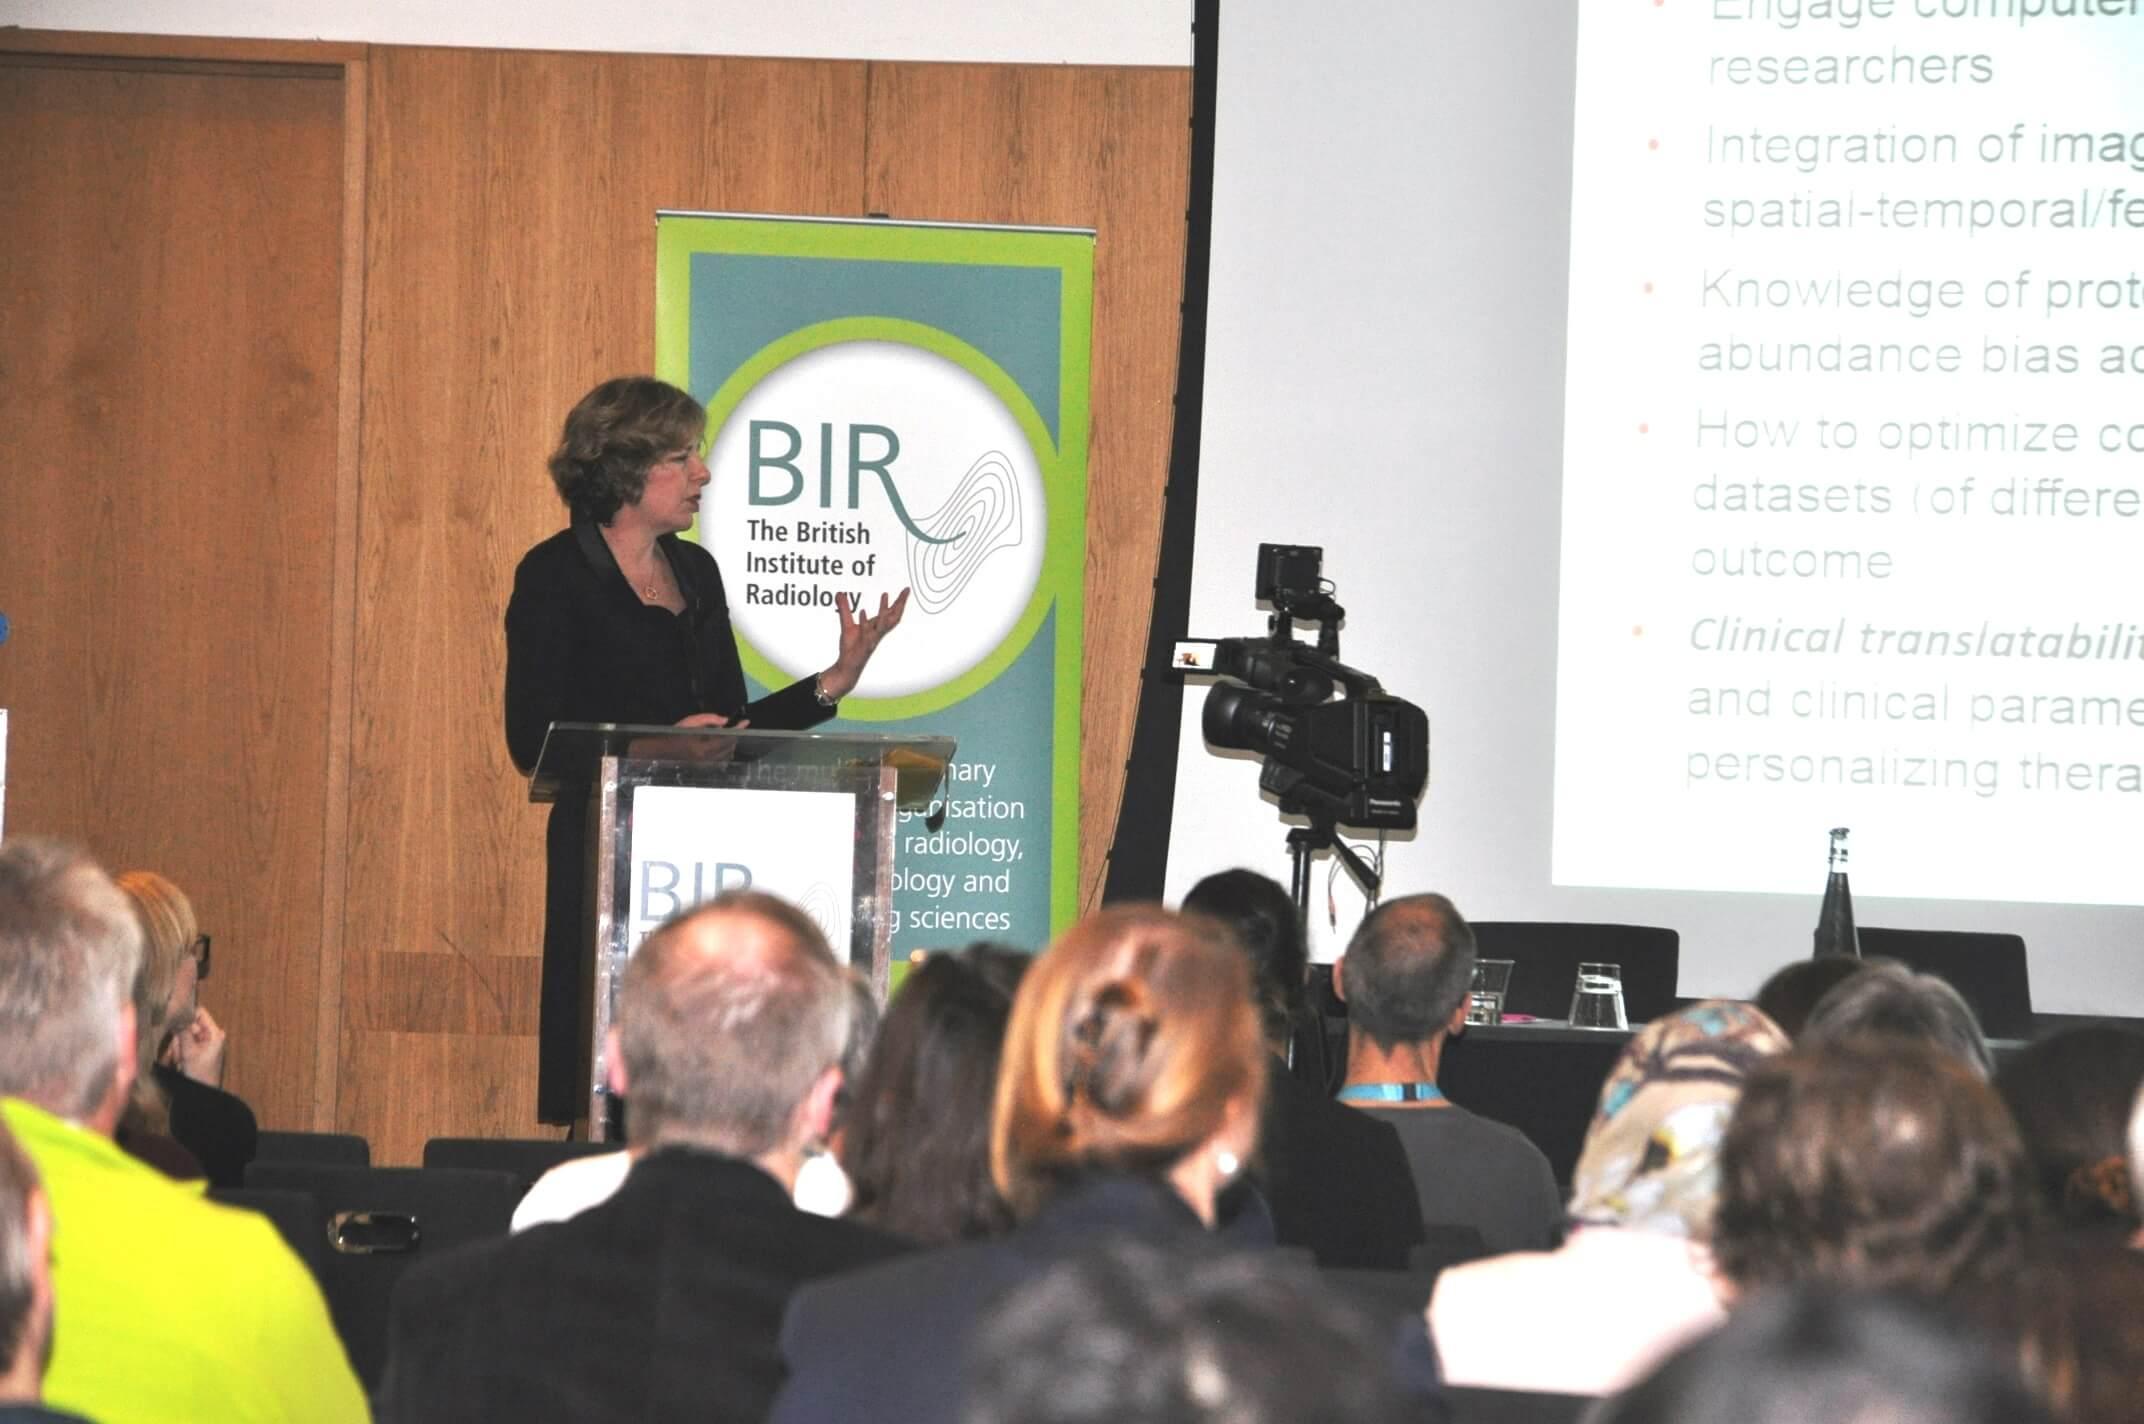 BIR Annual Congress 2017 - British Institute of Radiology